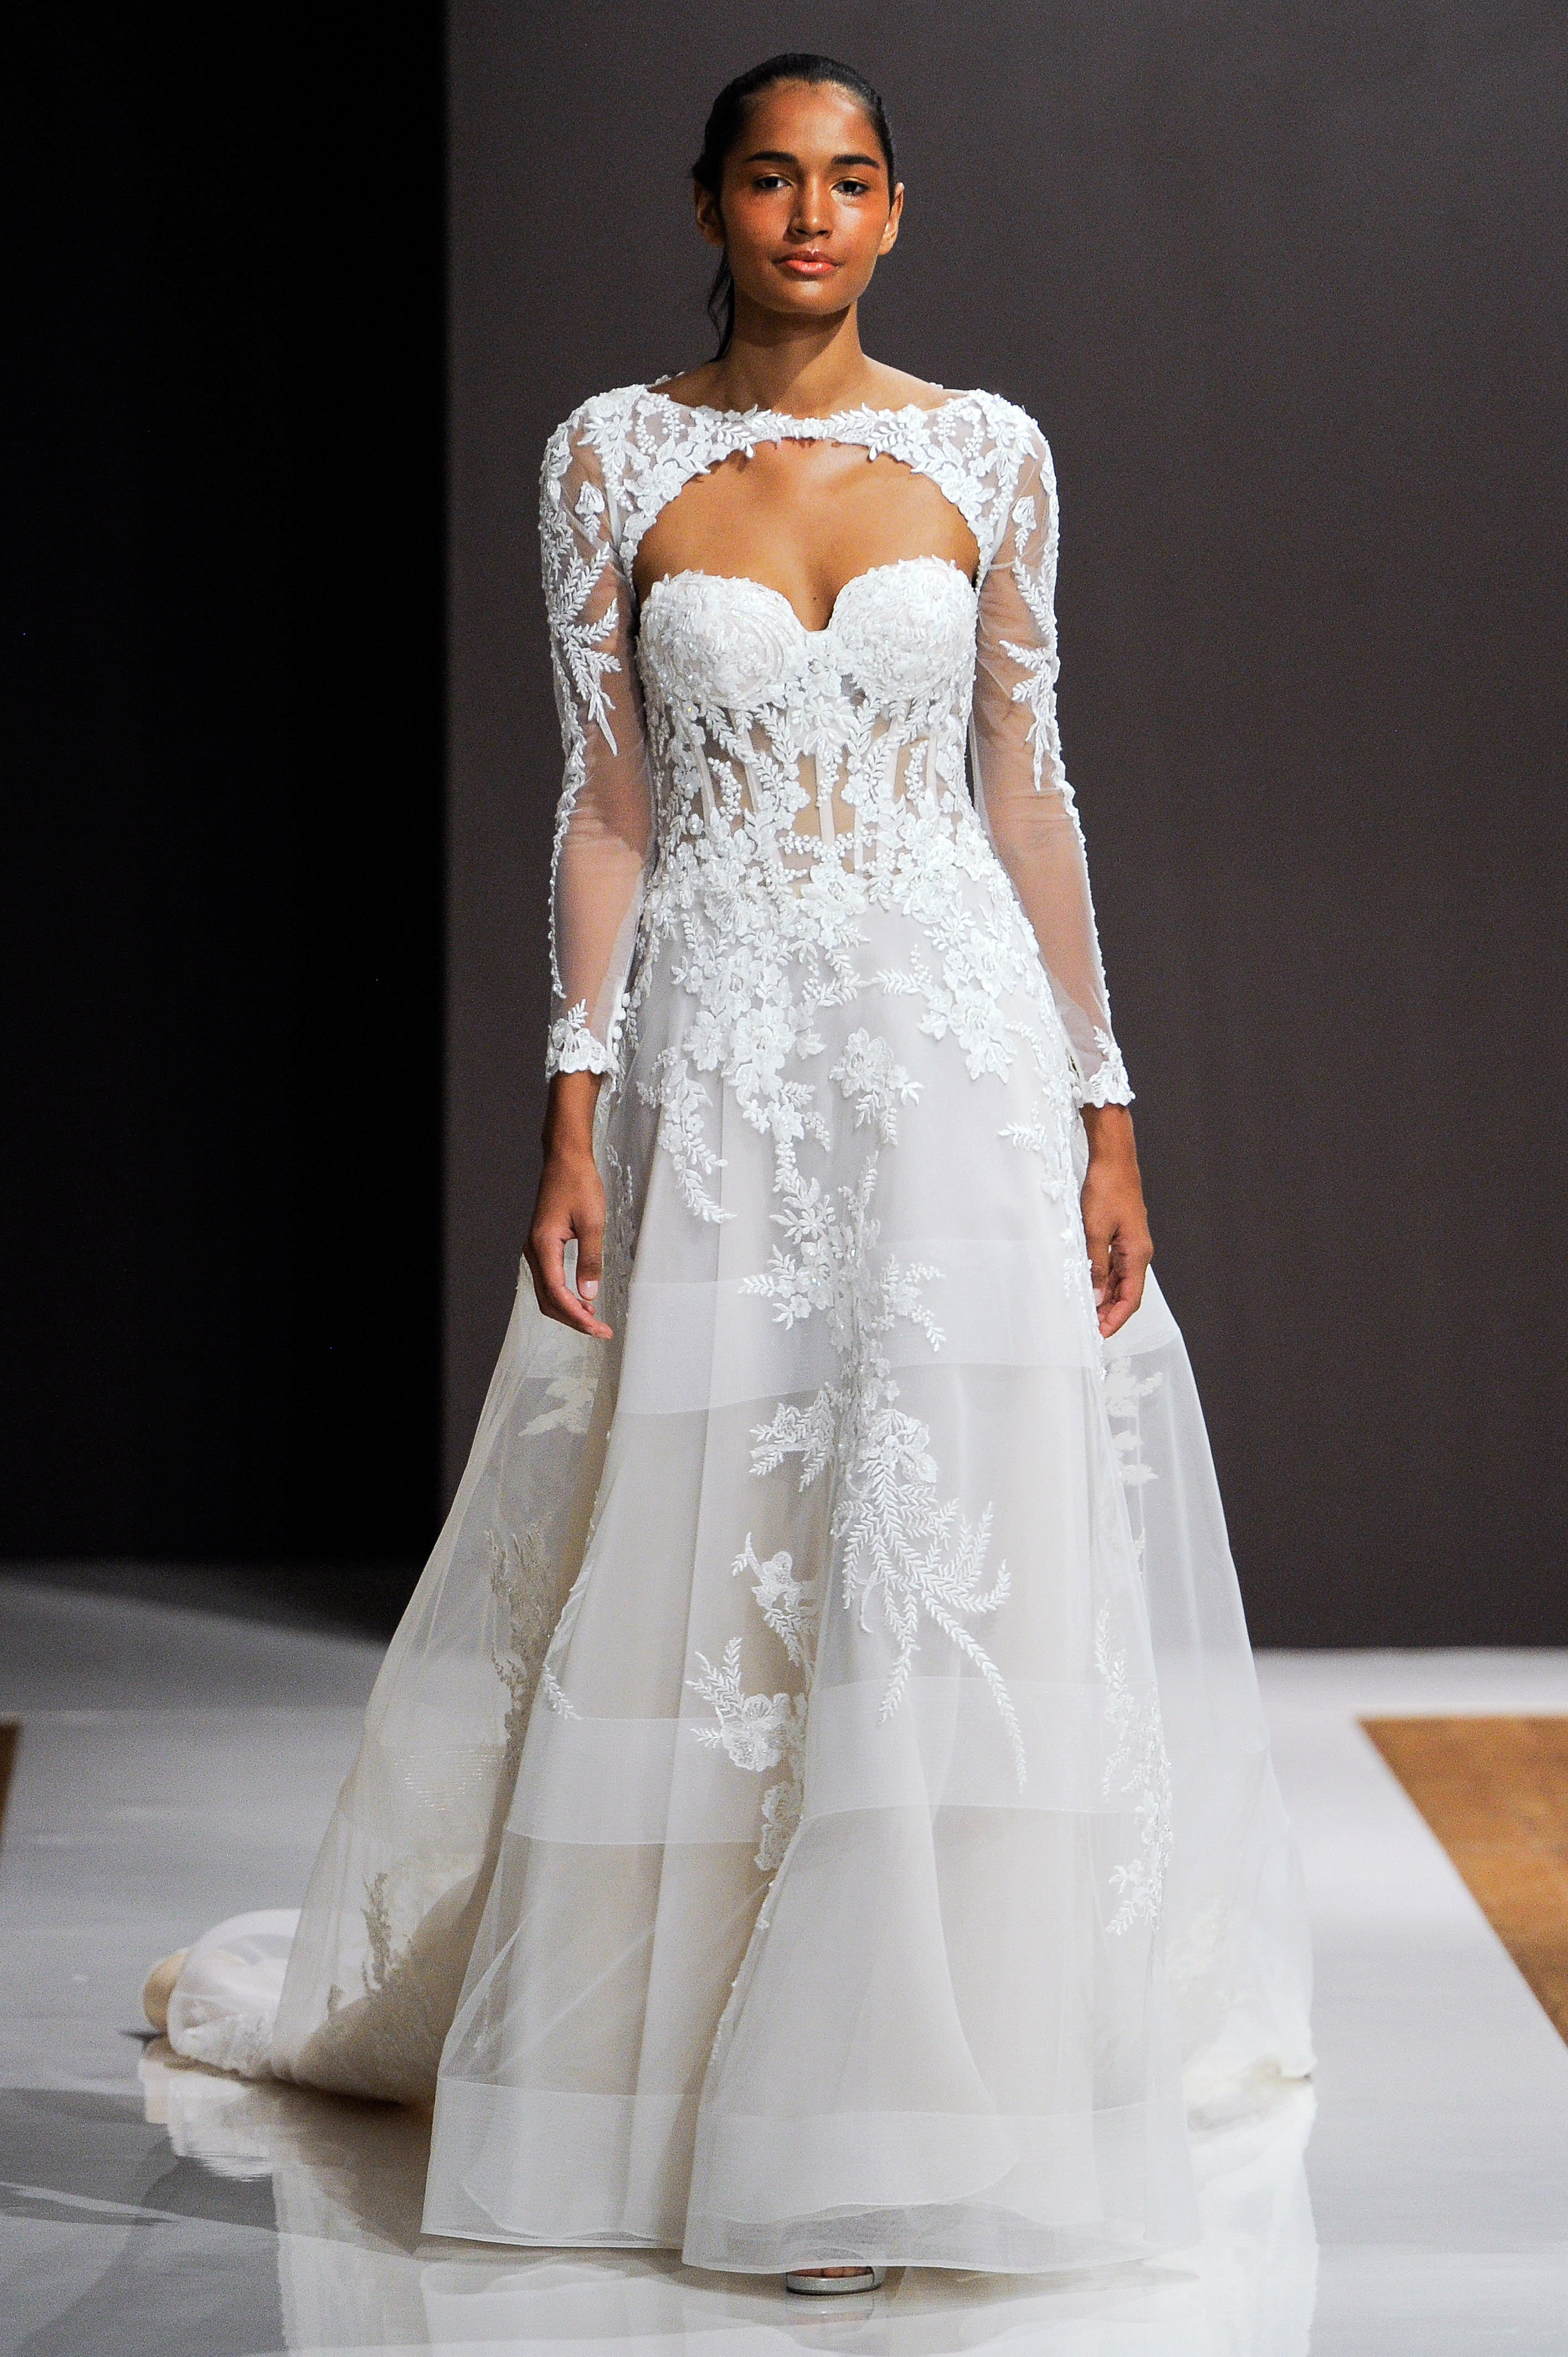 mark zunino wedding dress fall 2018 cut-out embellished long sleeves